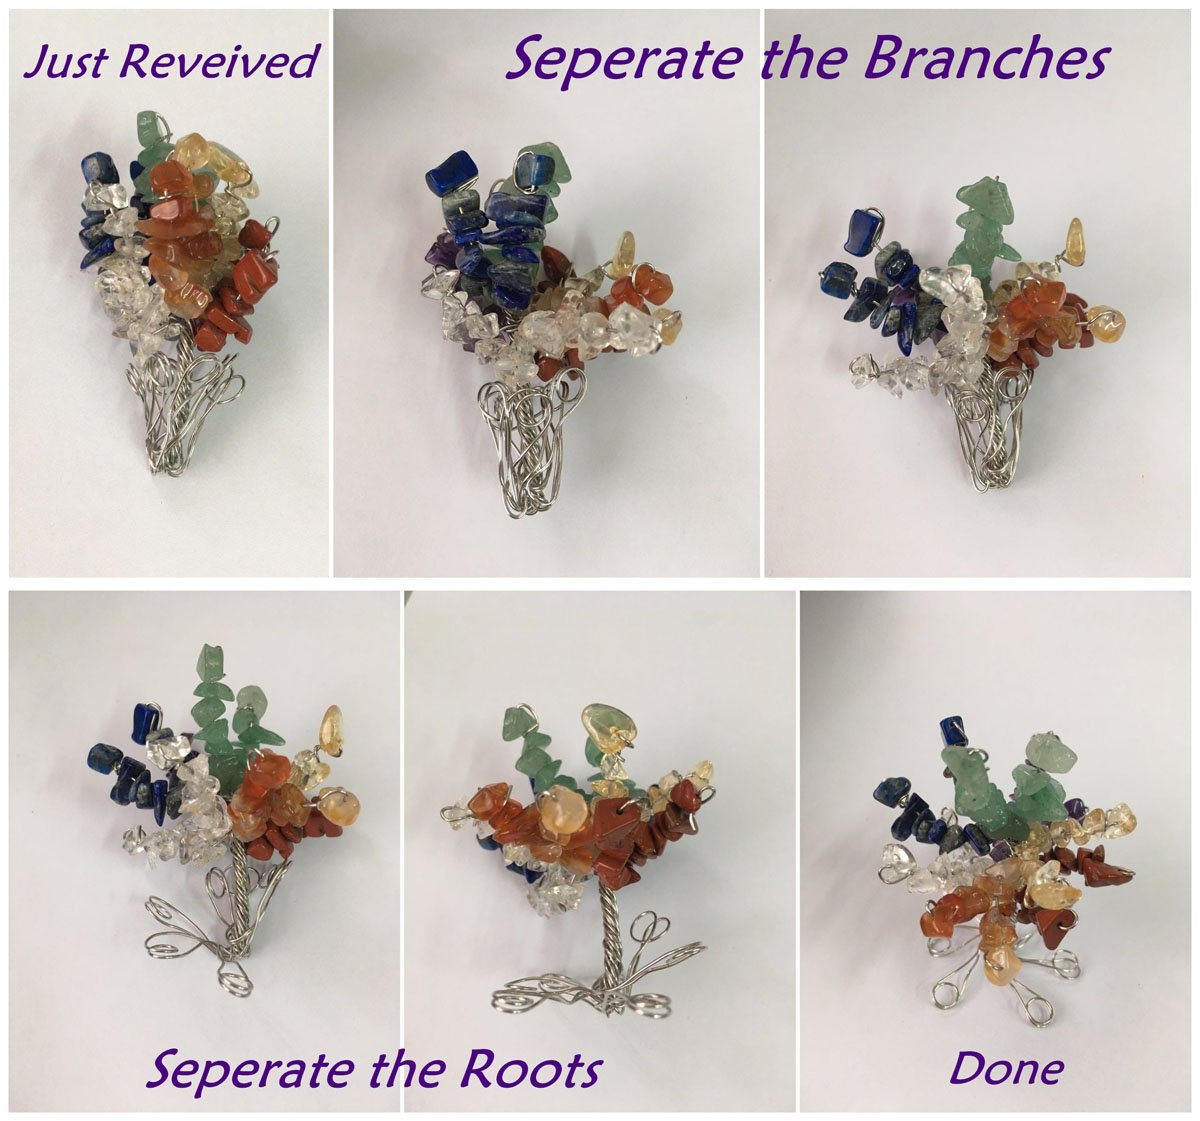 QGEM 7 Chakra Gems Tree of Life SetMoney Tree+ Irregular Chakra Stones+ Chakra Brarcelet Reiki Healing Feng Shui Spiritual Decor Ornaments